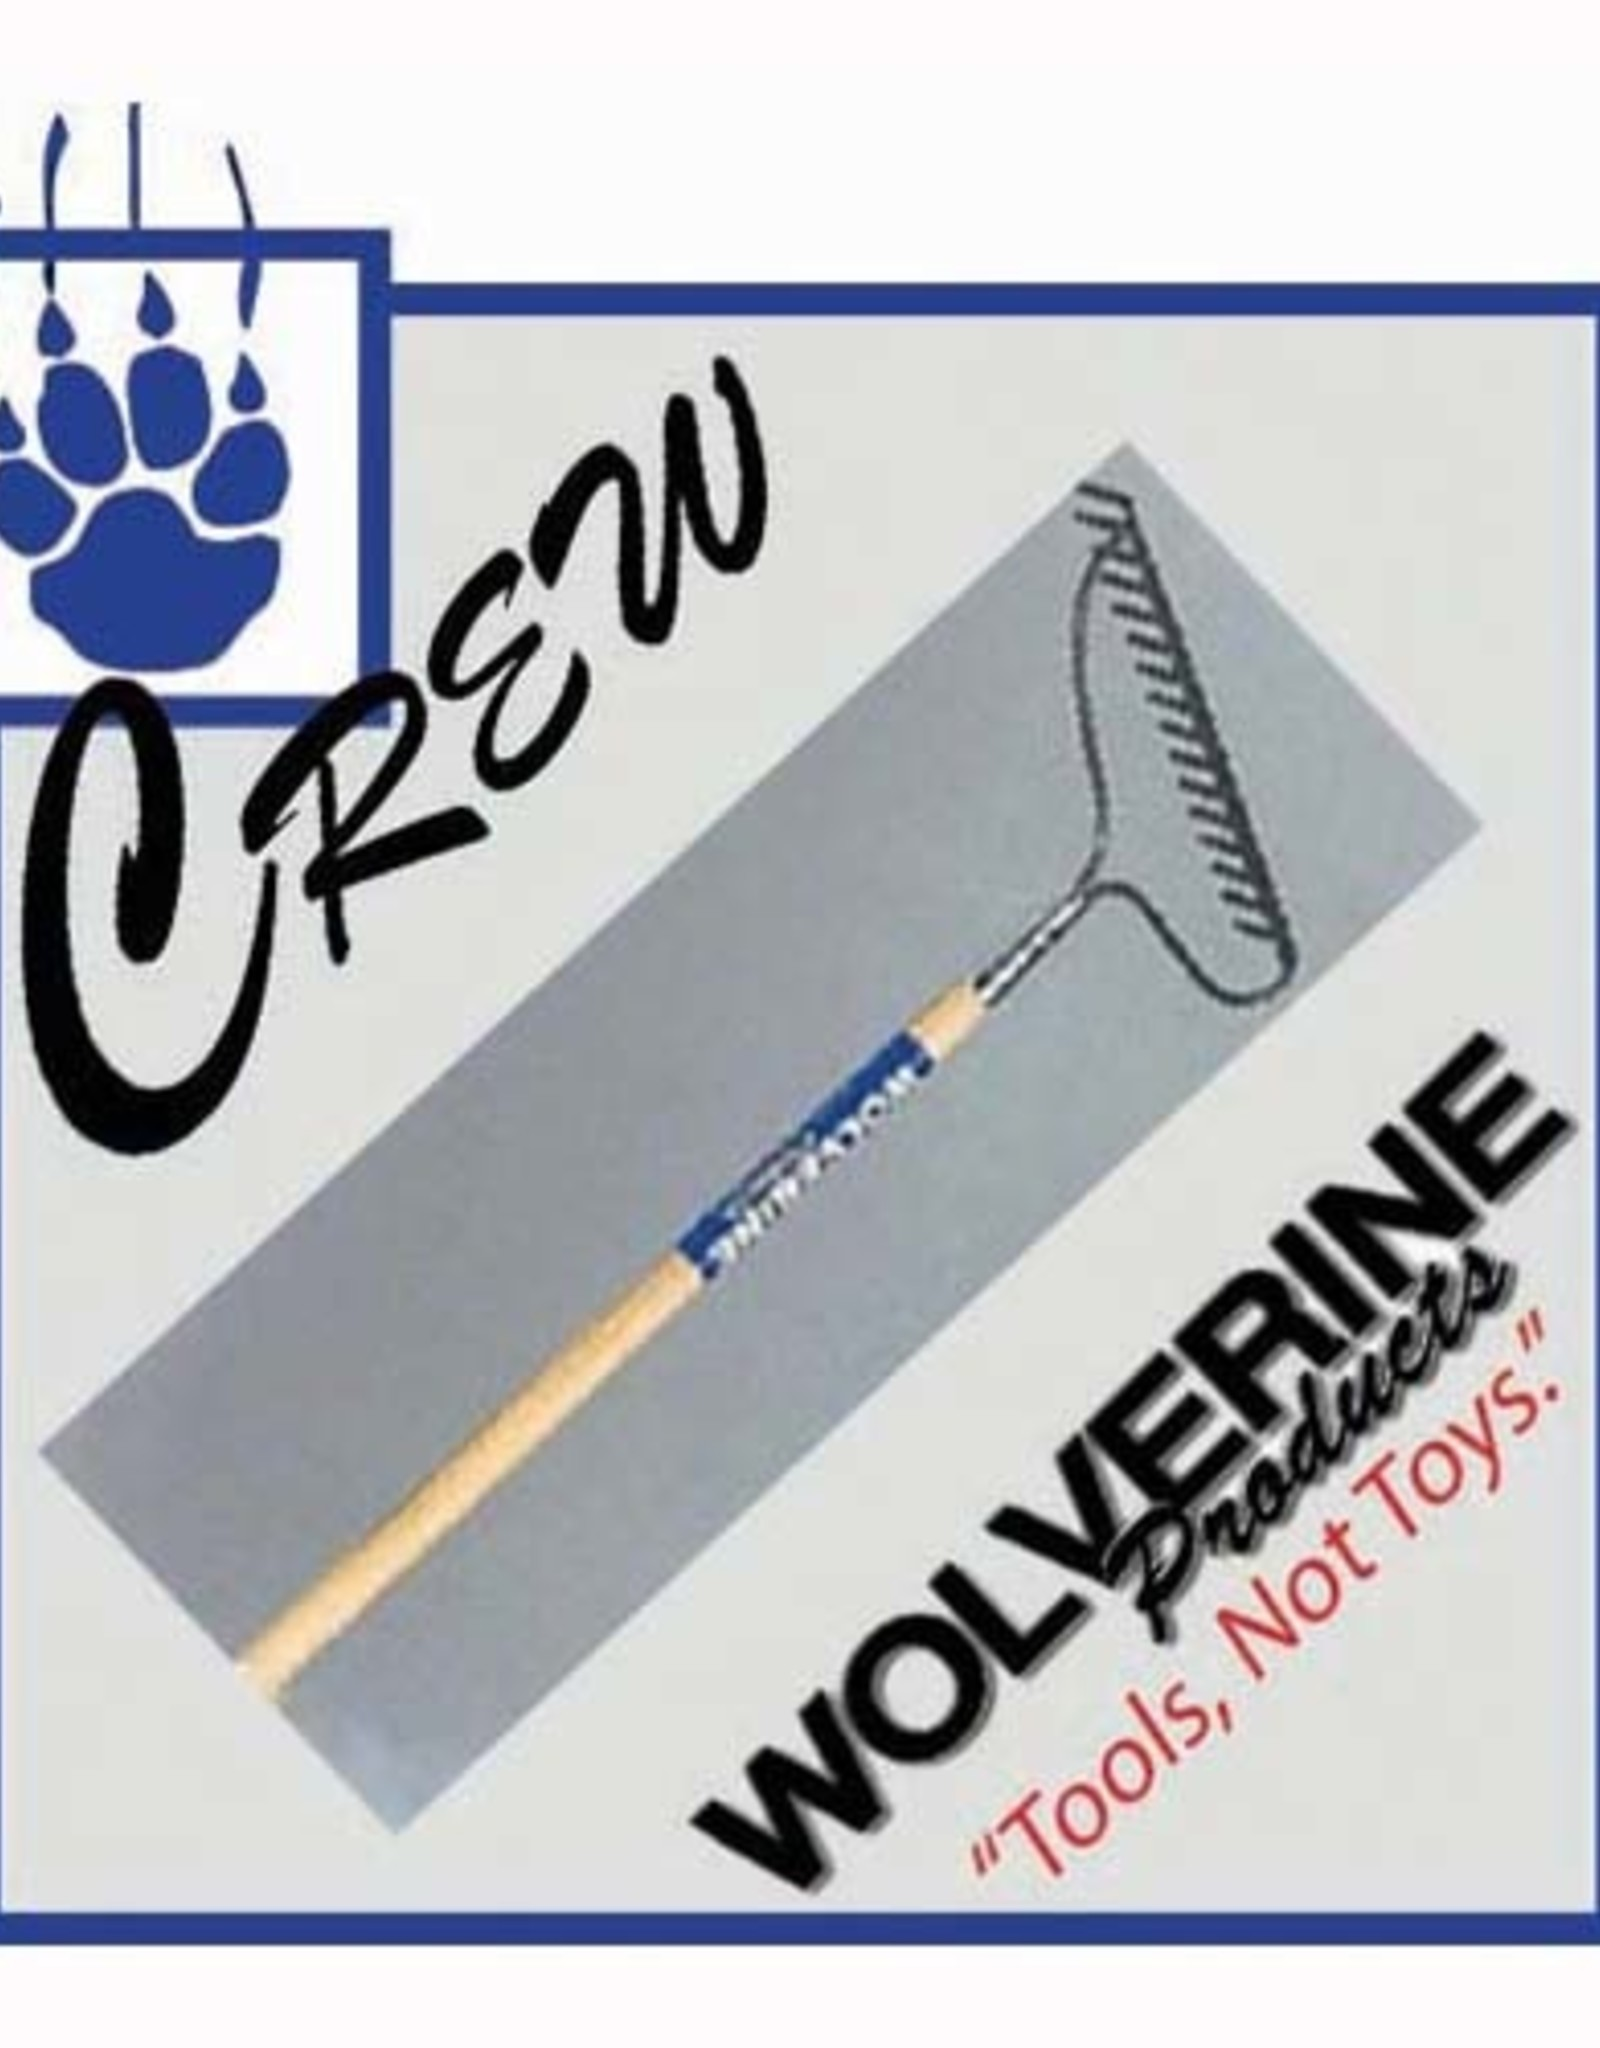 Wolverine Bow Rake, 16 tine